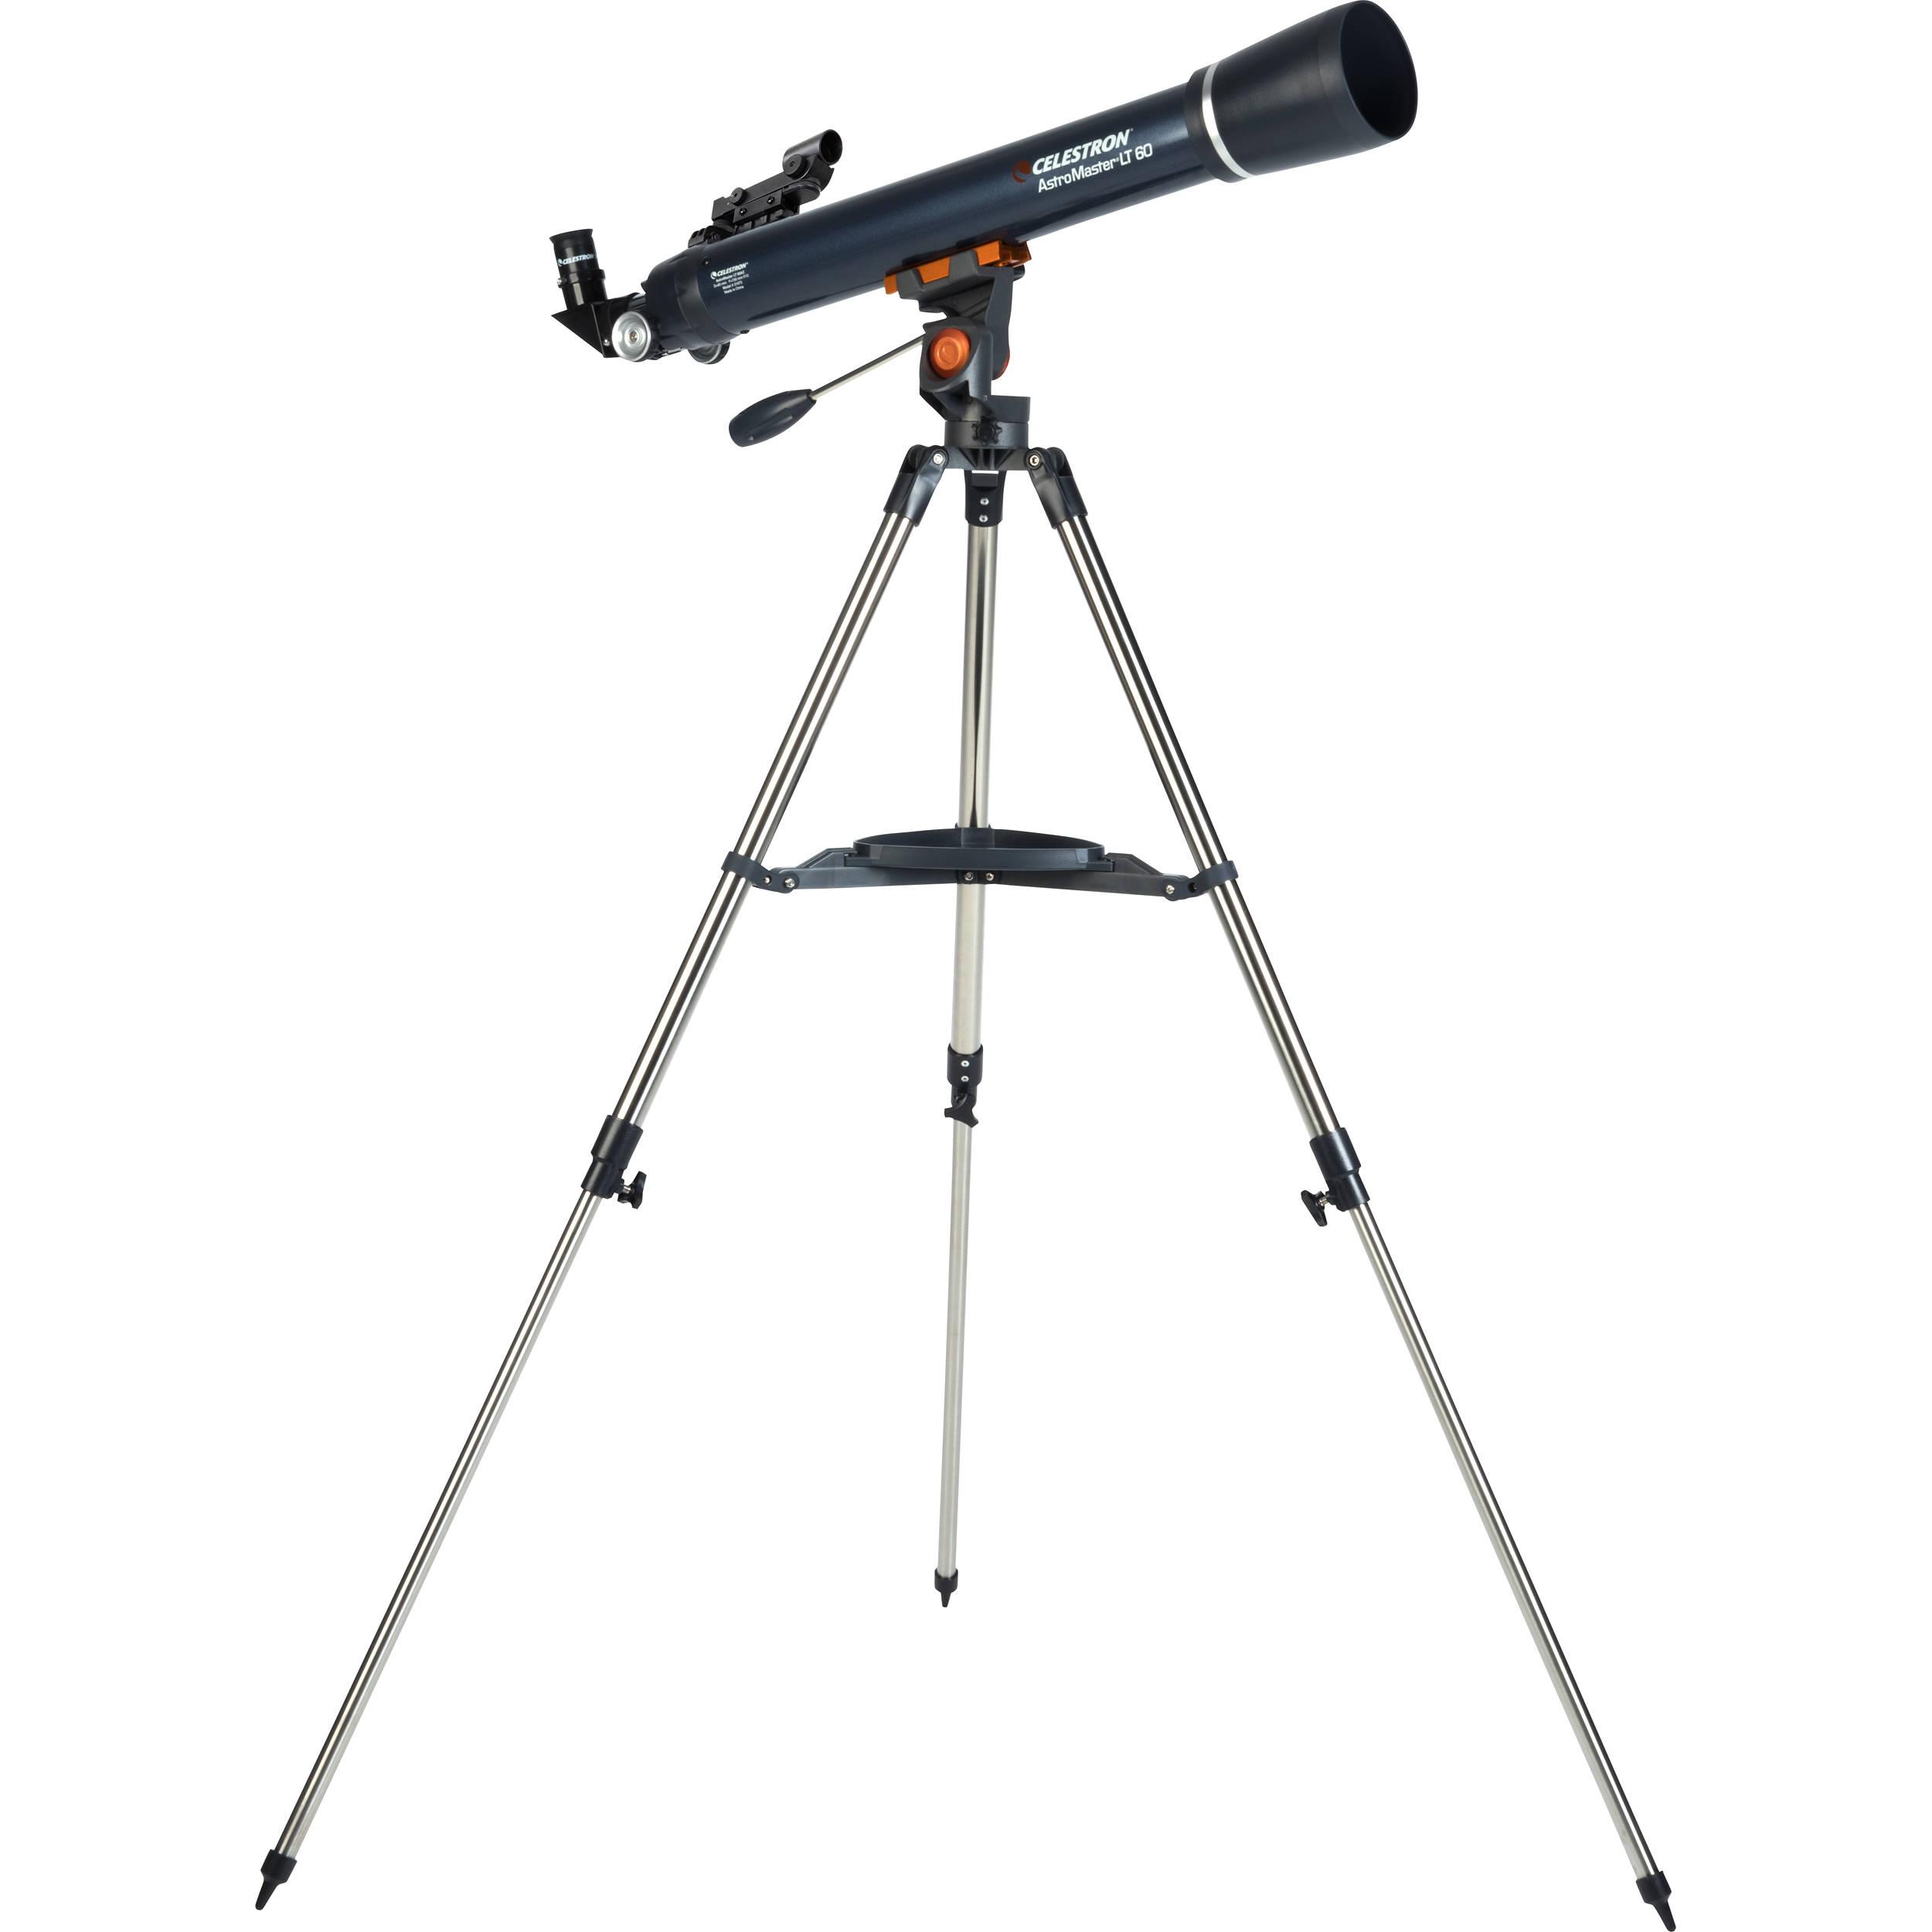 Celestron StarPointer Finderscope Bracket For AstroMaster Refractor Telescope